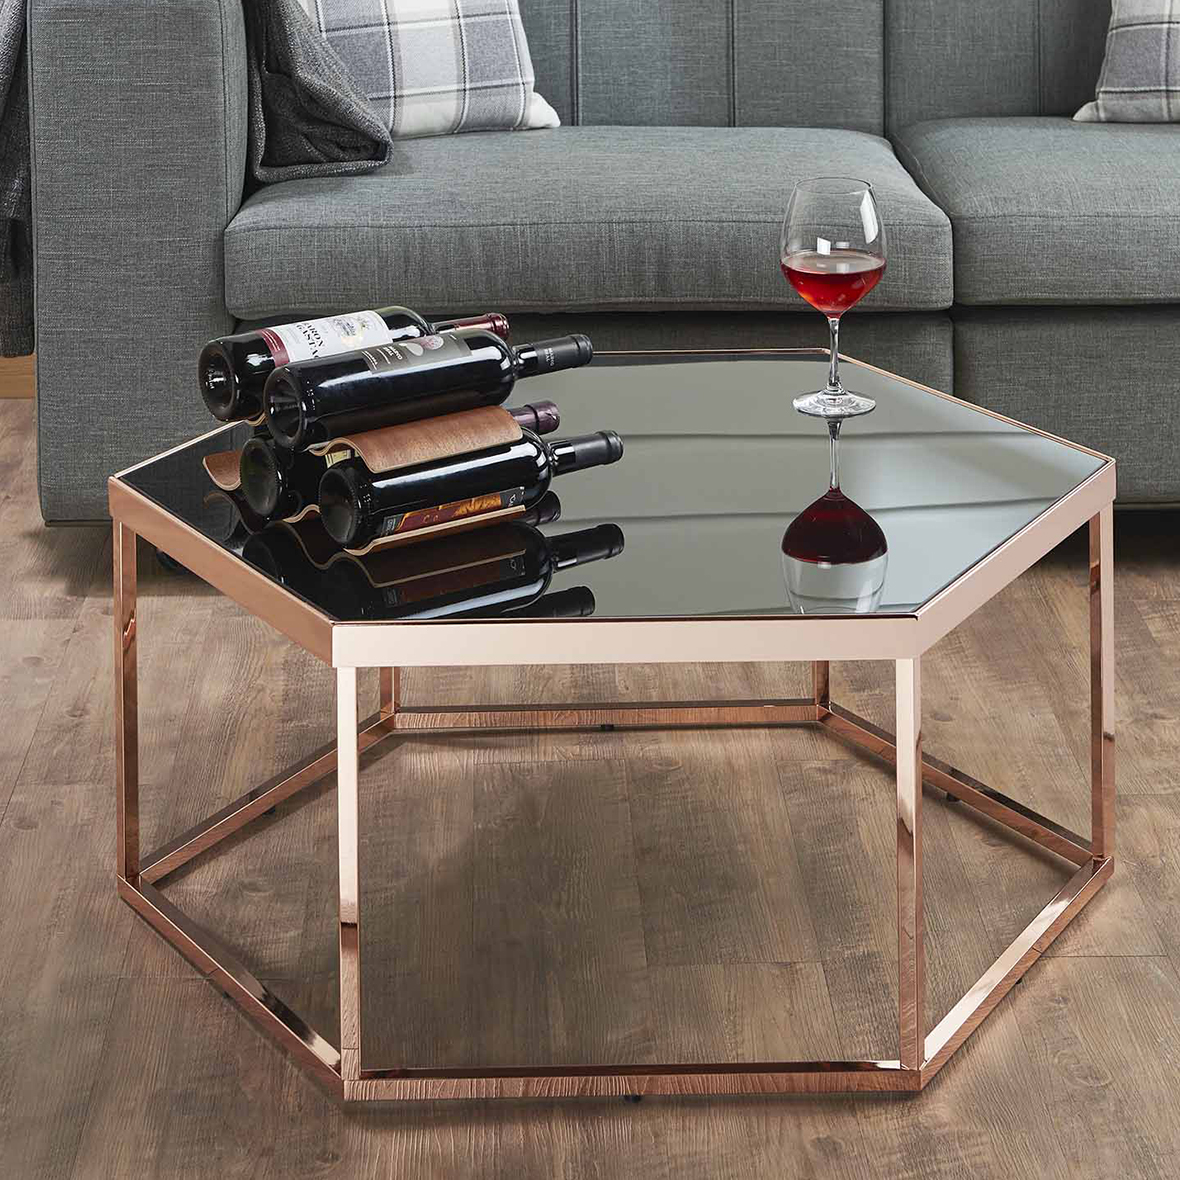 table basse hexagonale en verre noir fabricants de meubles d 39 int rieur slicethinner. Black Bedroom Furniture Sets. Home Design Ideas